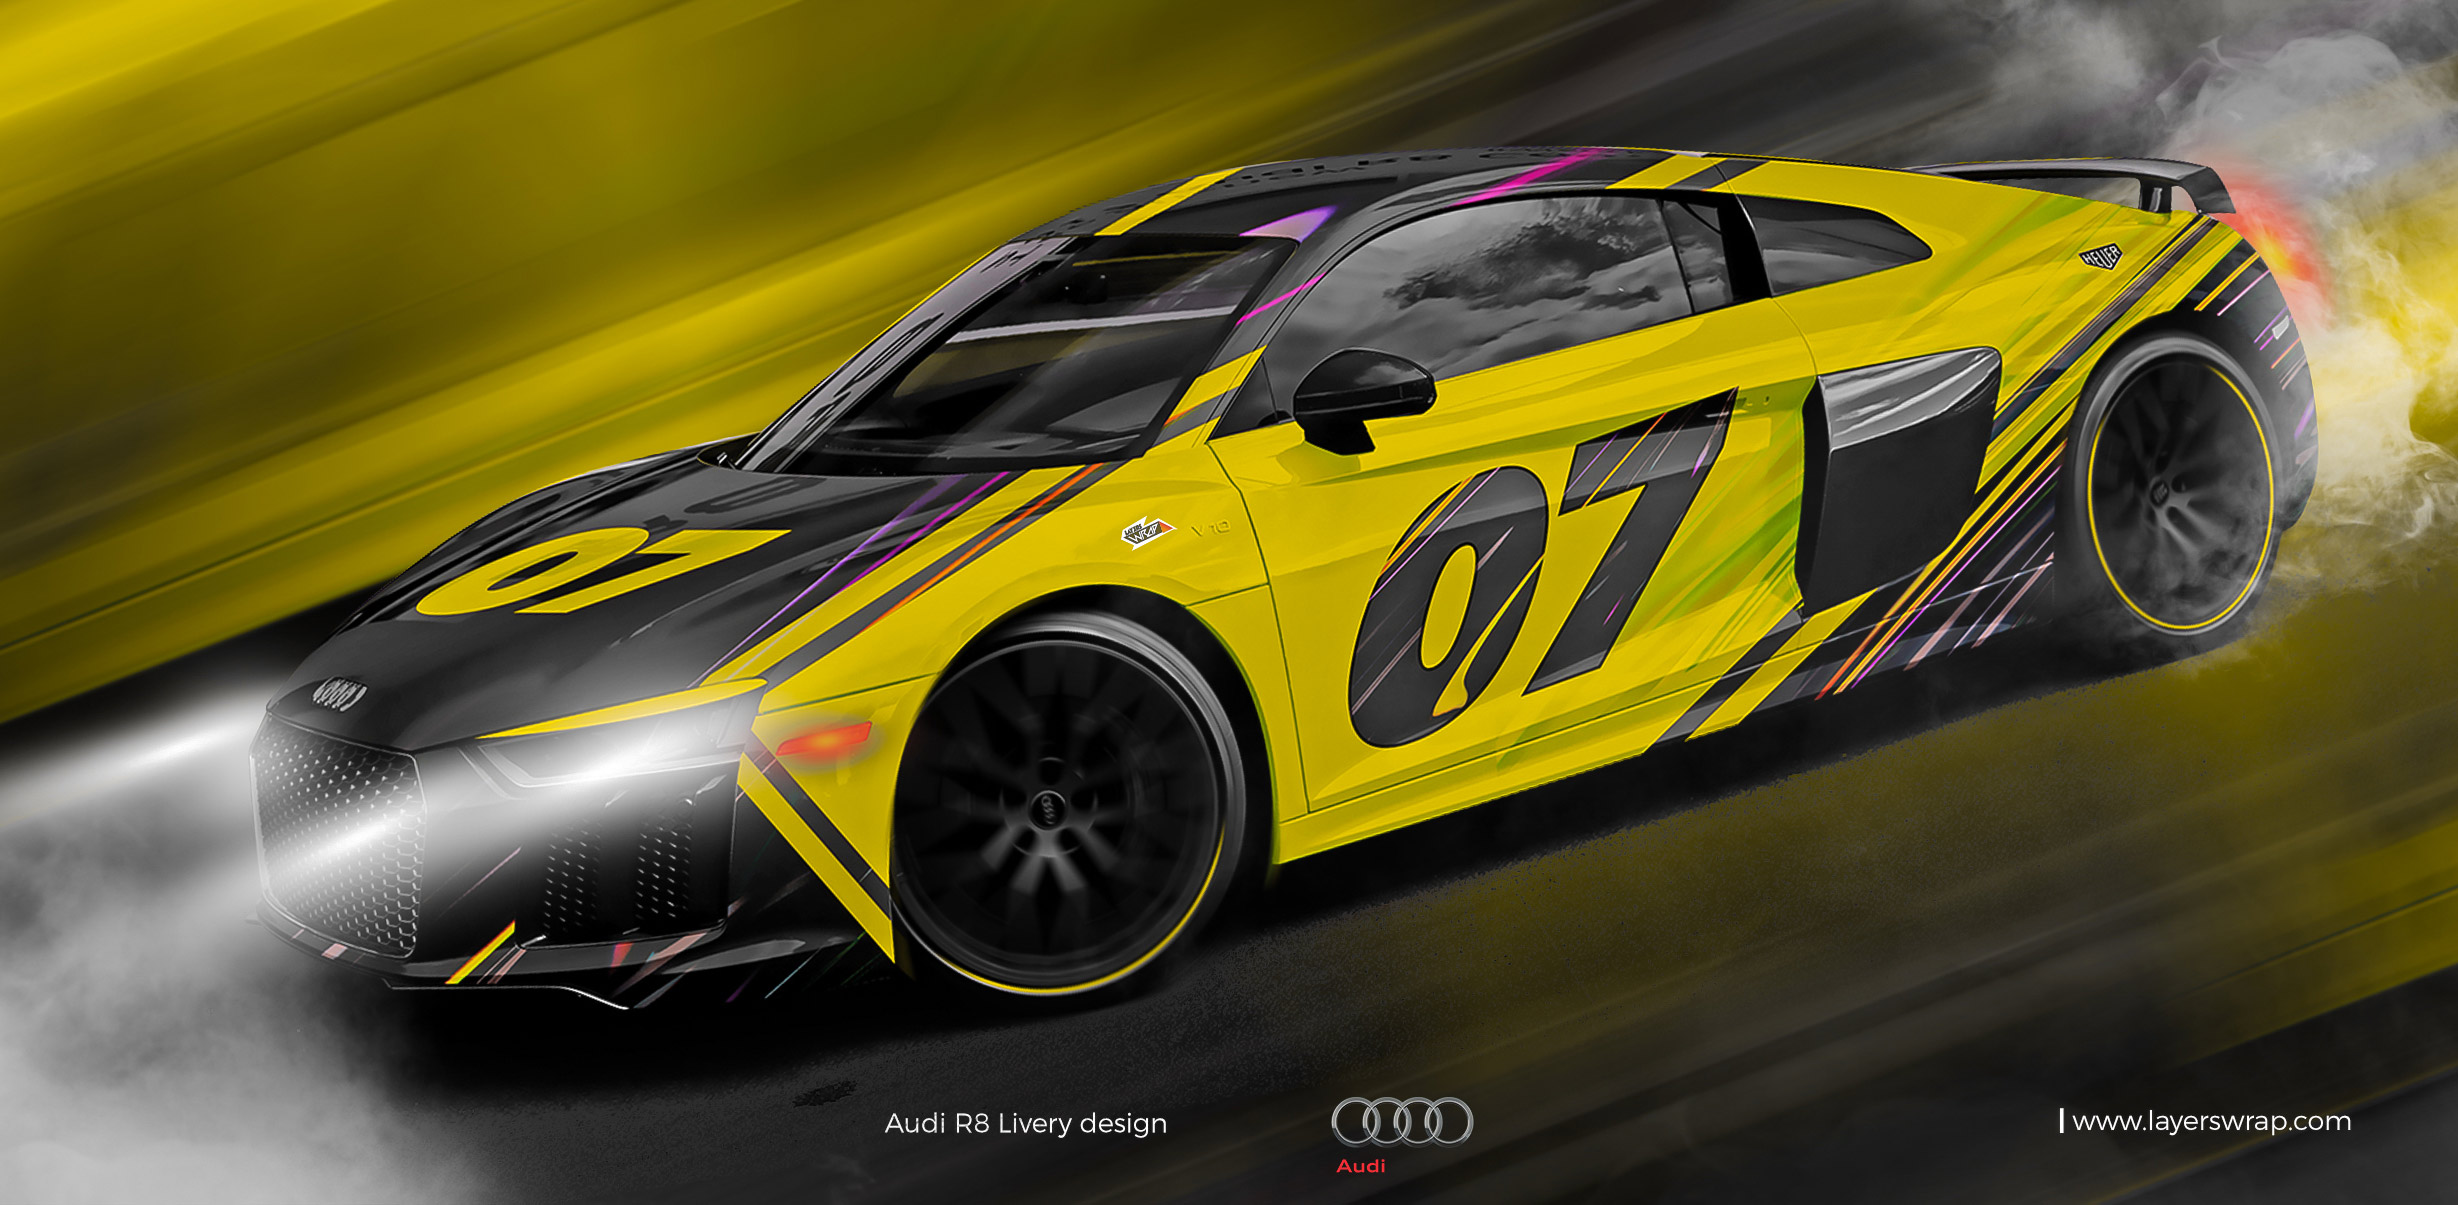 Audi R8 wrap design for Sale